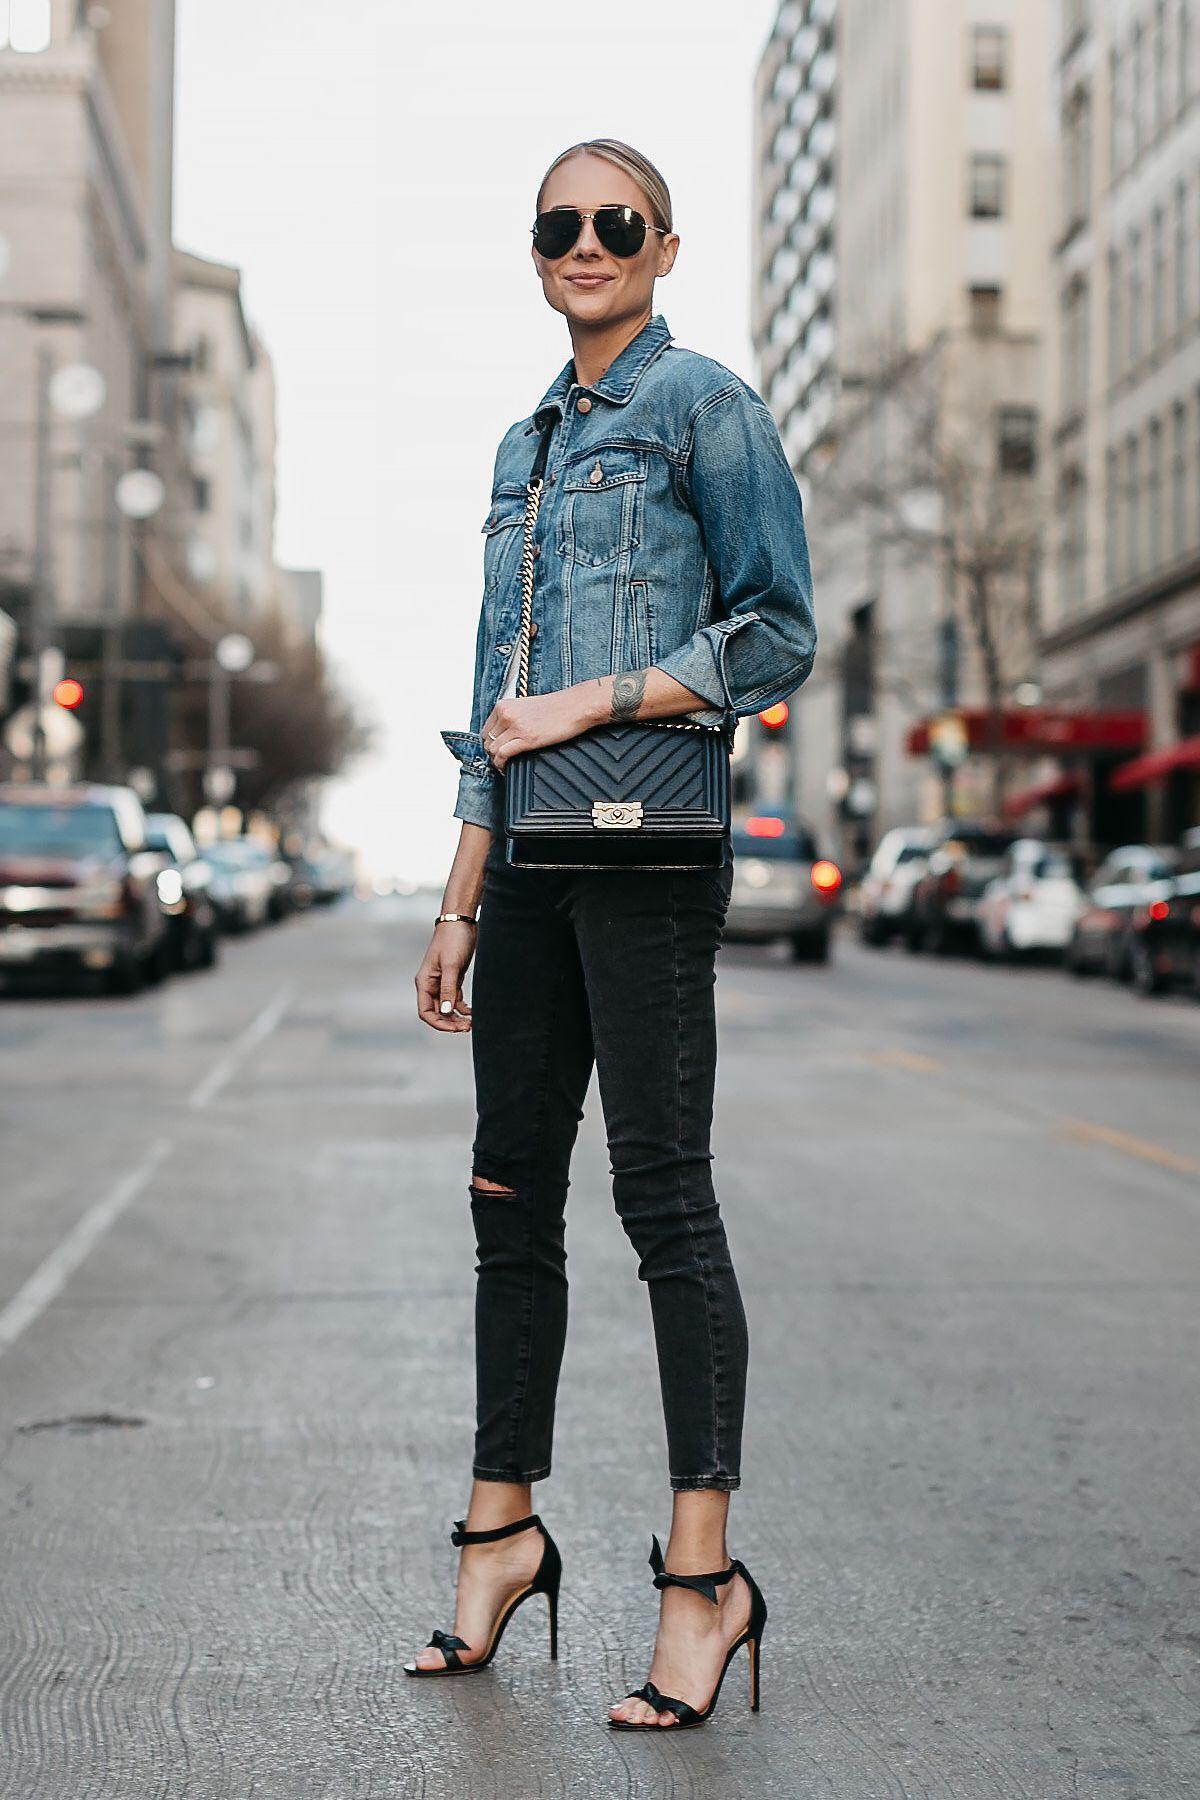 c03fc1fb706 Blonde Woman Wearing Joes Jeans Black Ripped Skinny Jeans Denim Jacket  Chanel Black Boy Bag Alexandre Birman Black Bow Heels Celine Aviator  Sunglasses ...